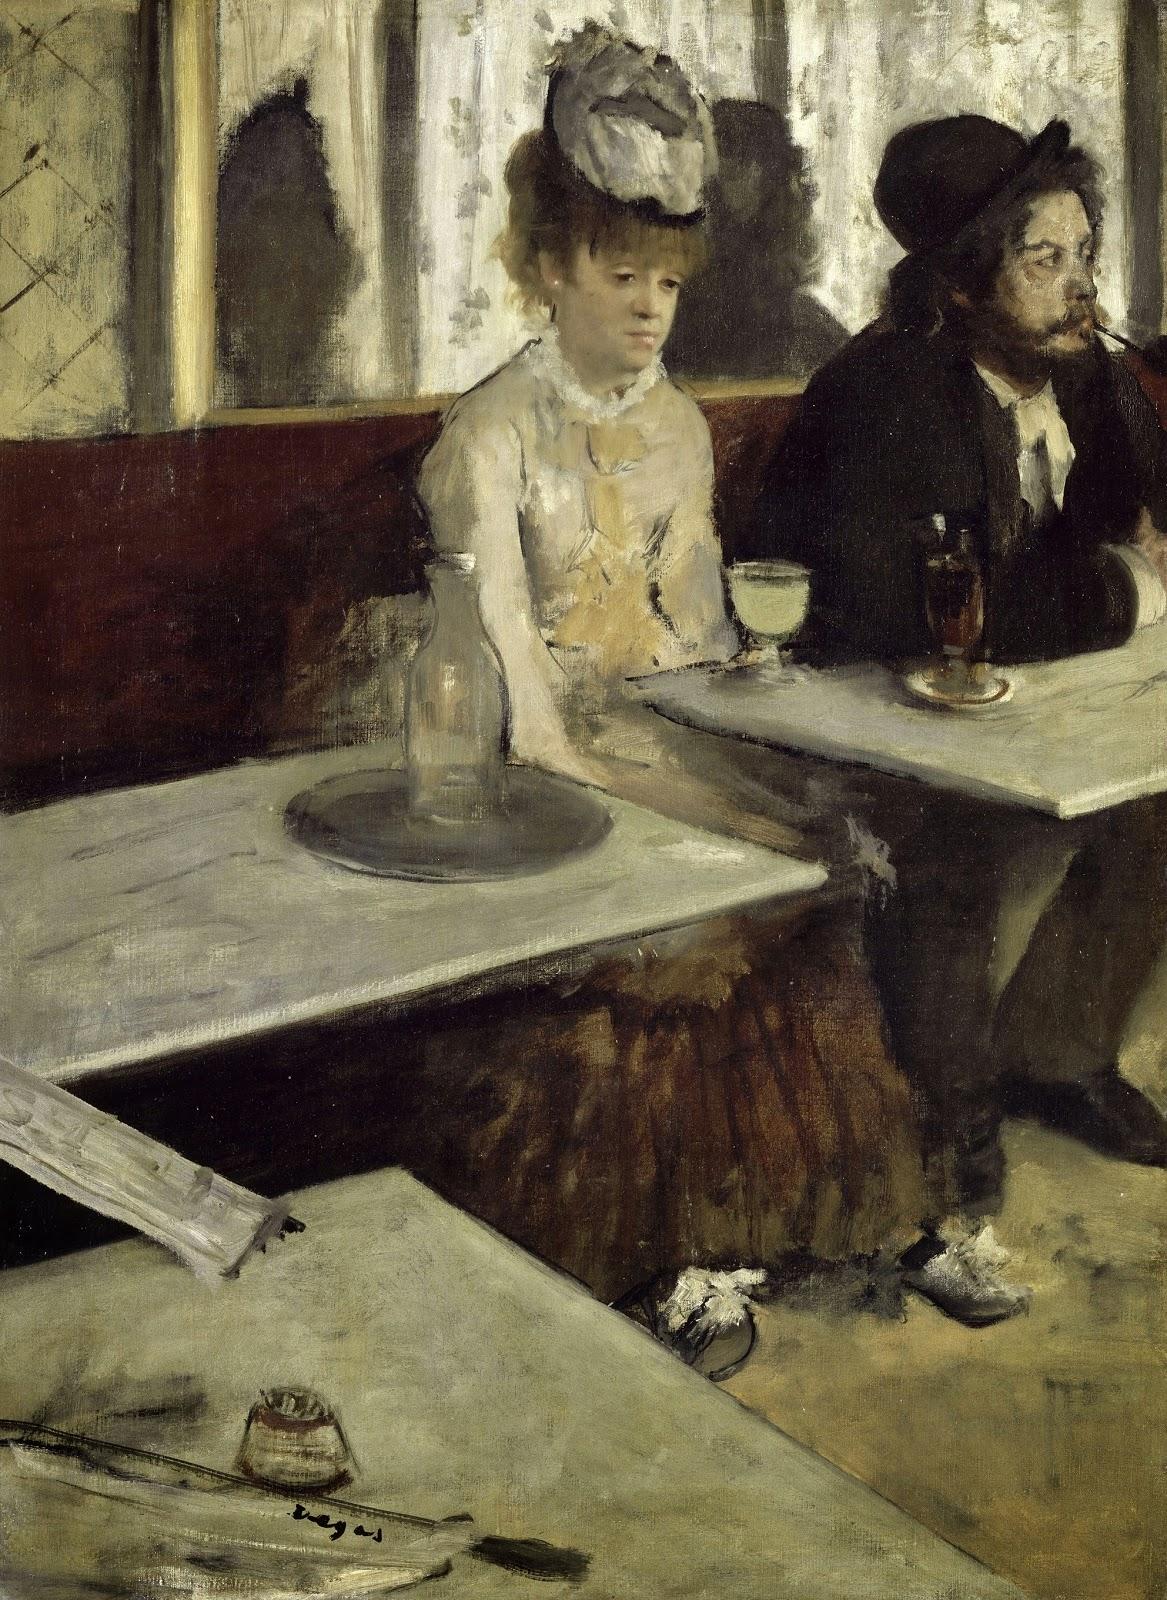 Edgar Degas, Dans un café (también conocido como l'Absinthe), 1873